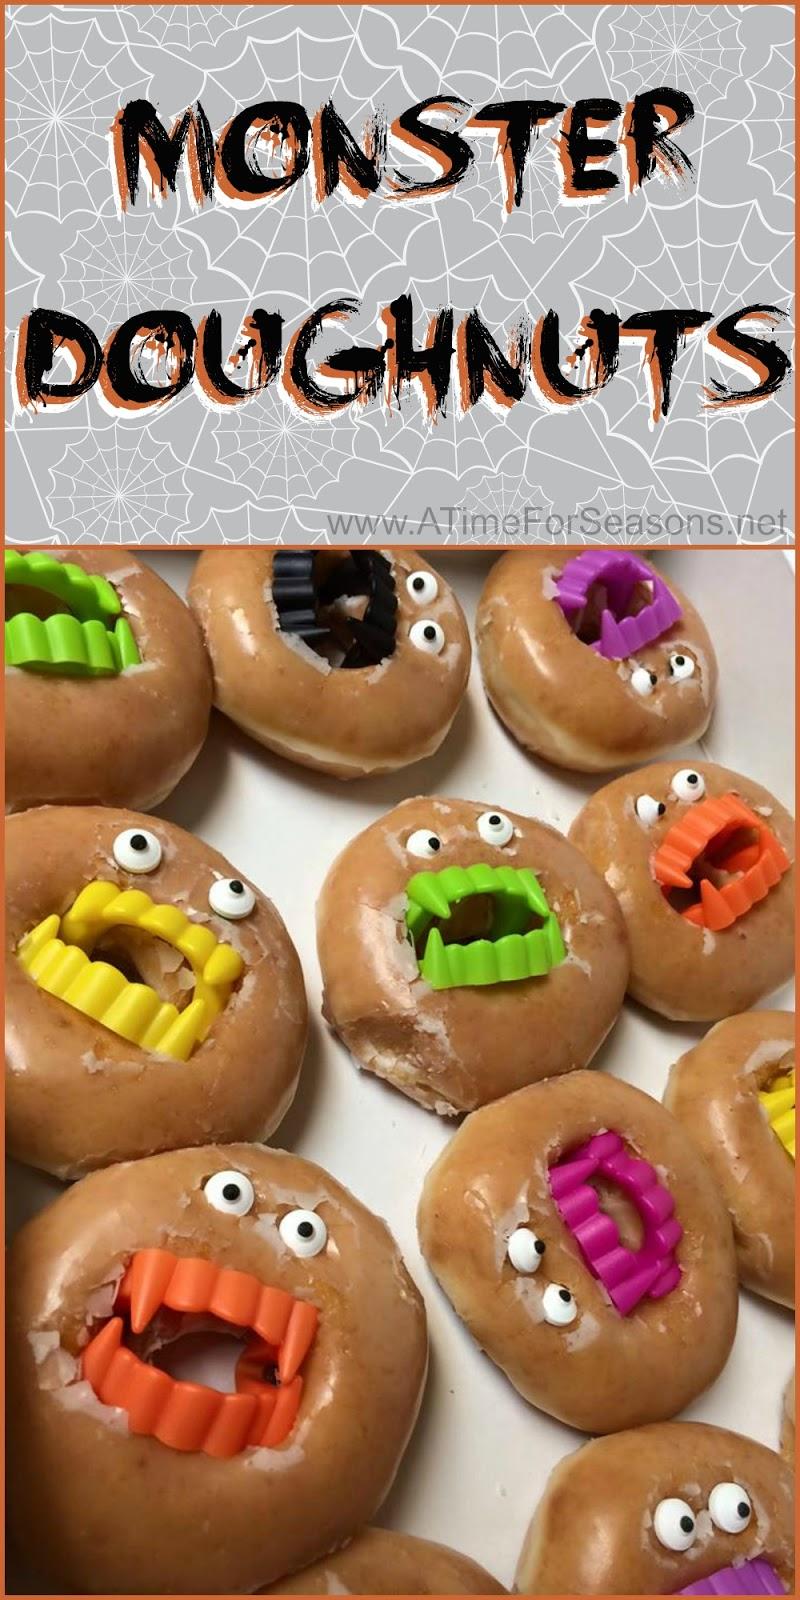 Monster doughnuts for Halloween food ideas for preschoolers